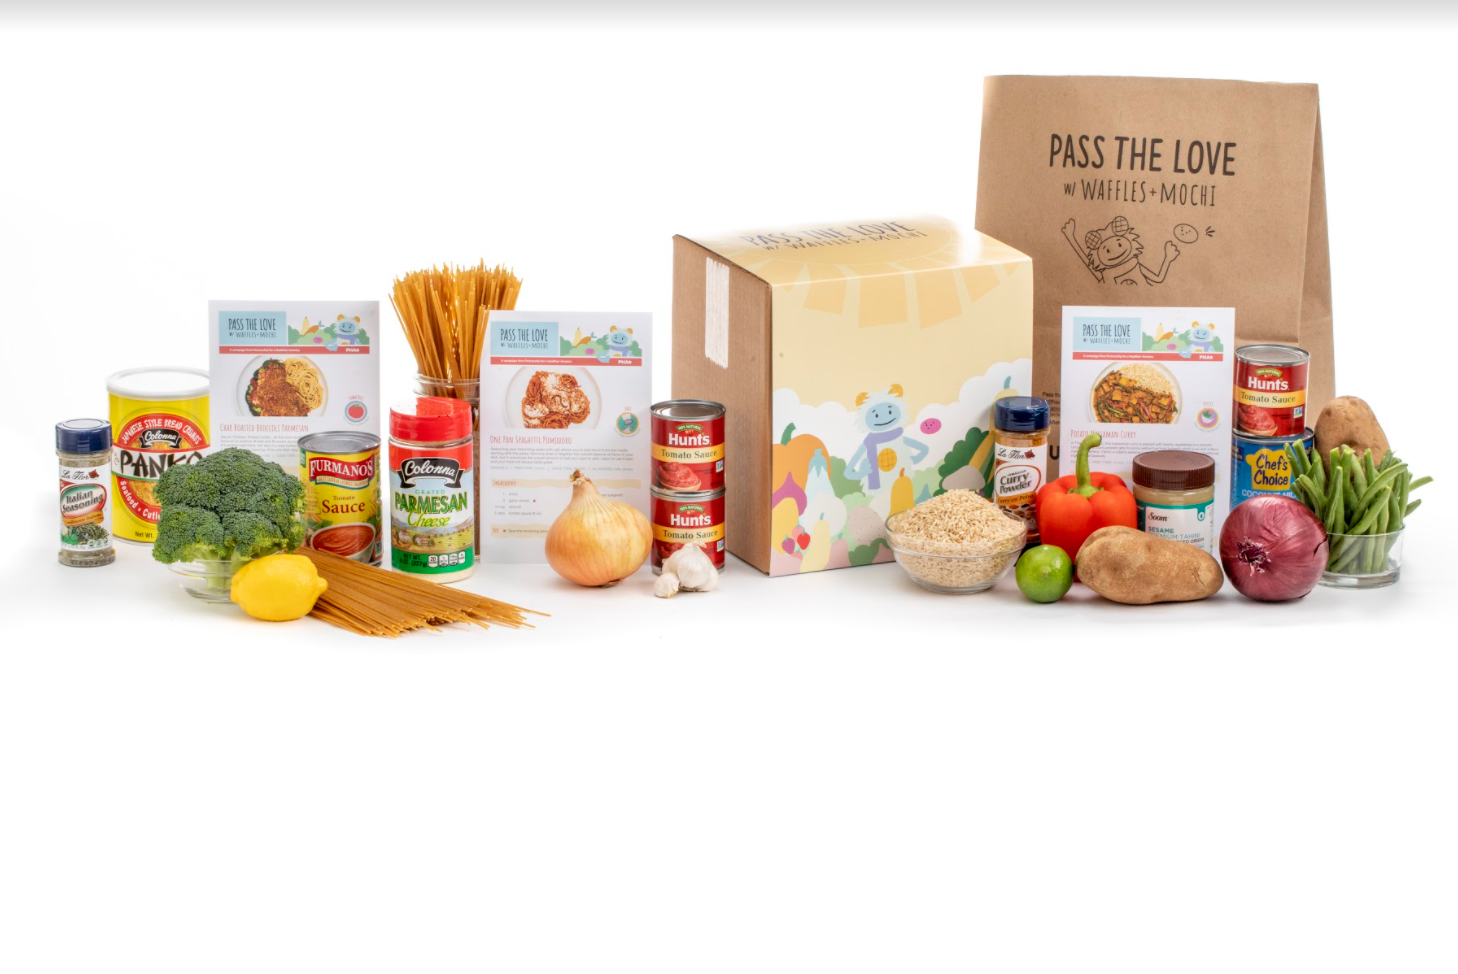 Screenshot of a Pass the Love Meal Kit.